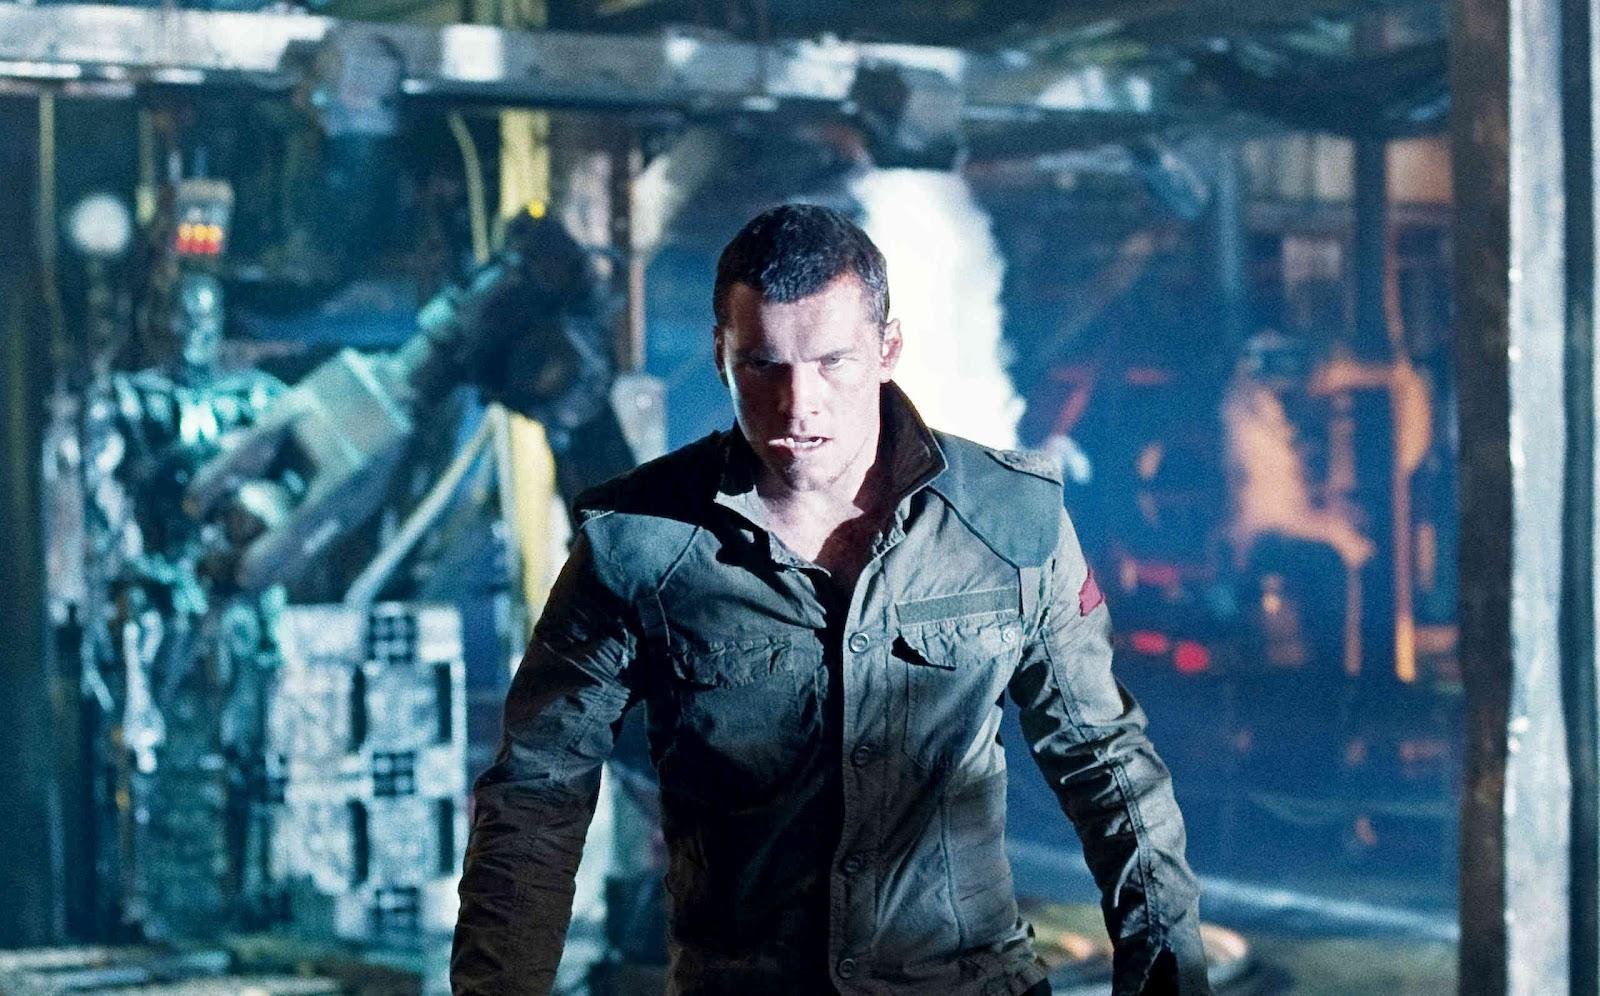 Terminator-Salvation-Marcus-Wright-terminator-salvation-13886693-2560-1594.jpg